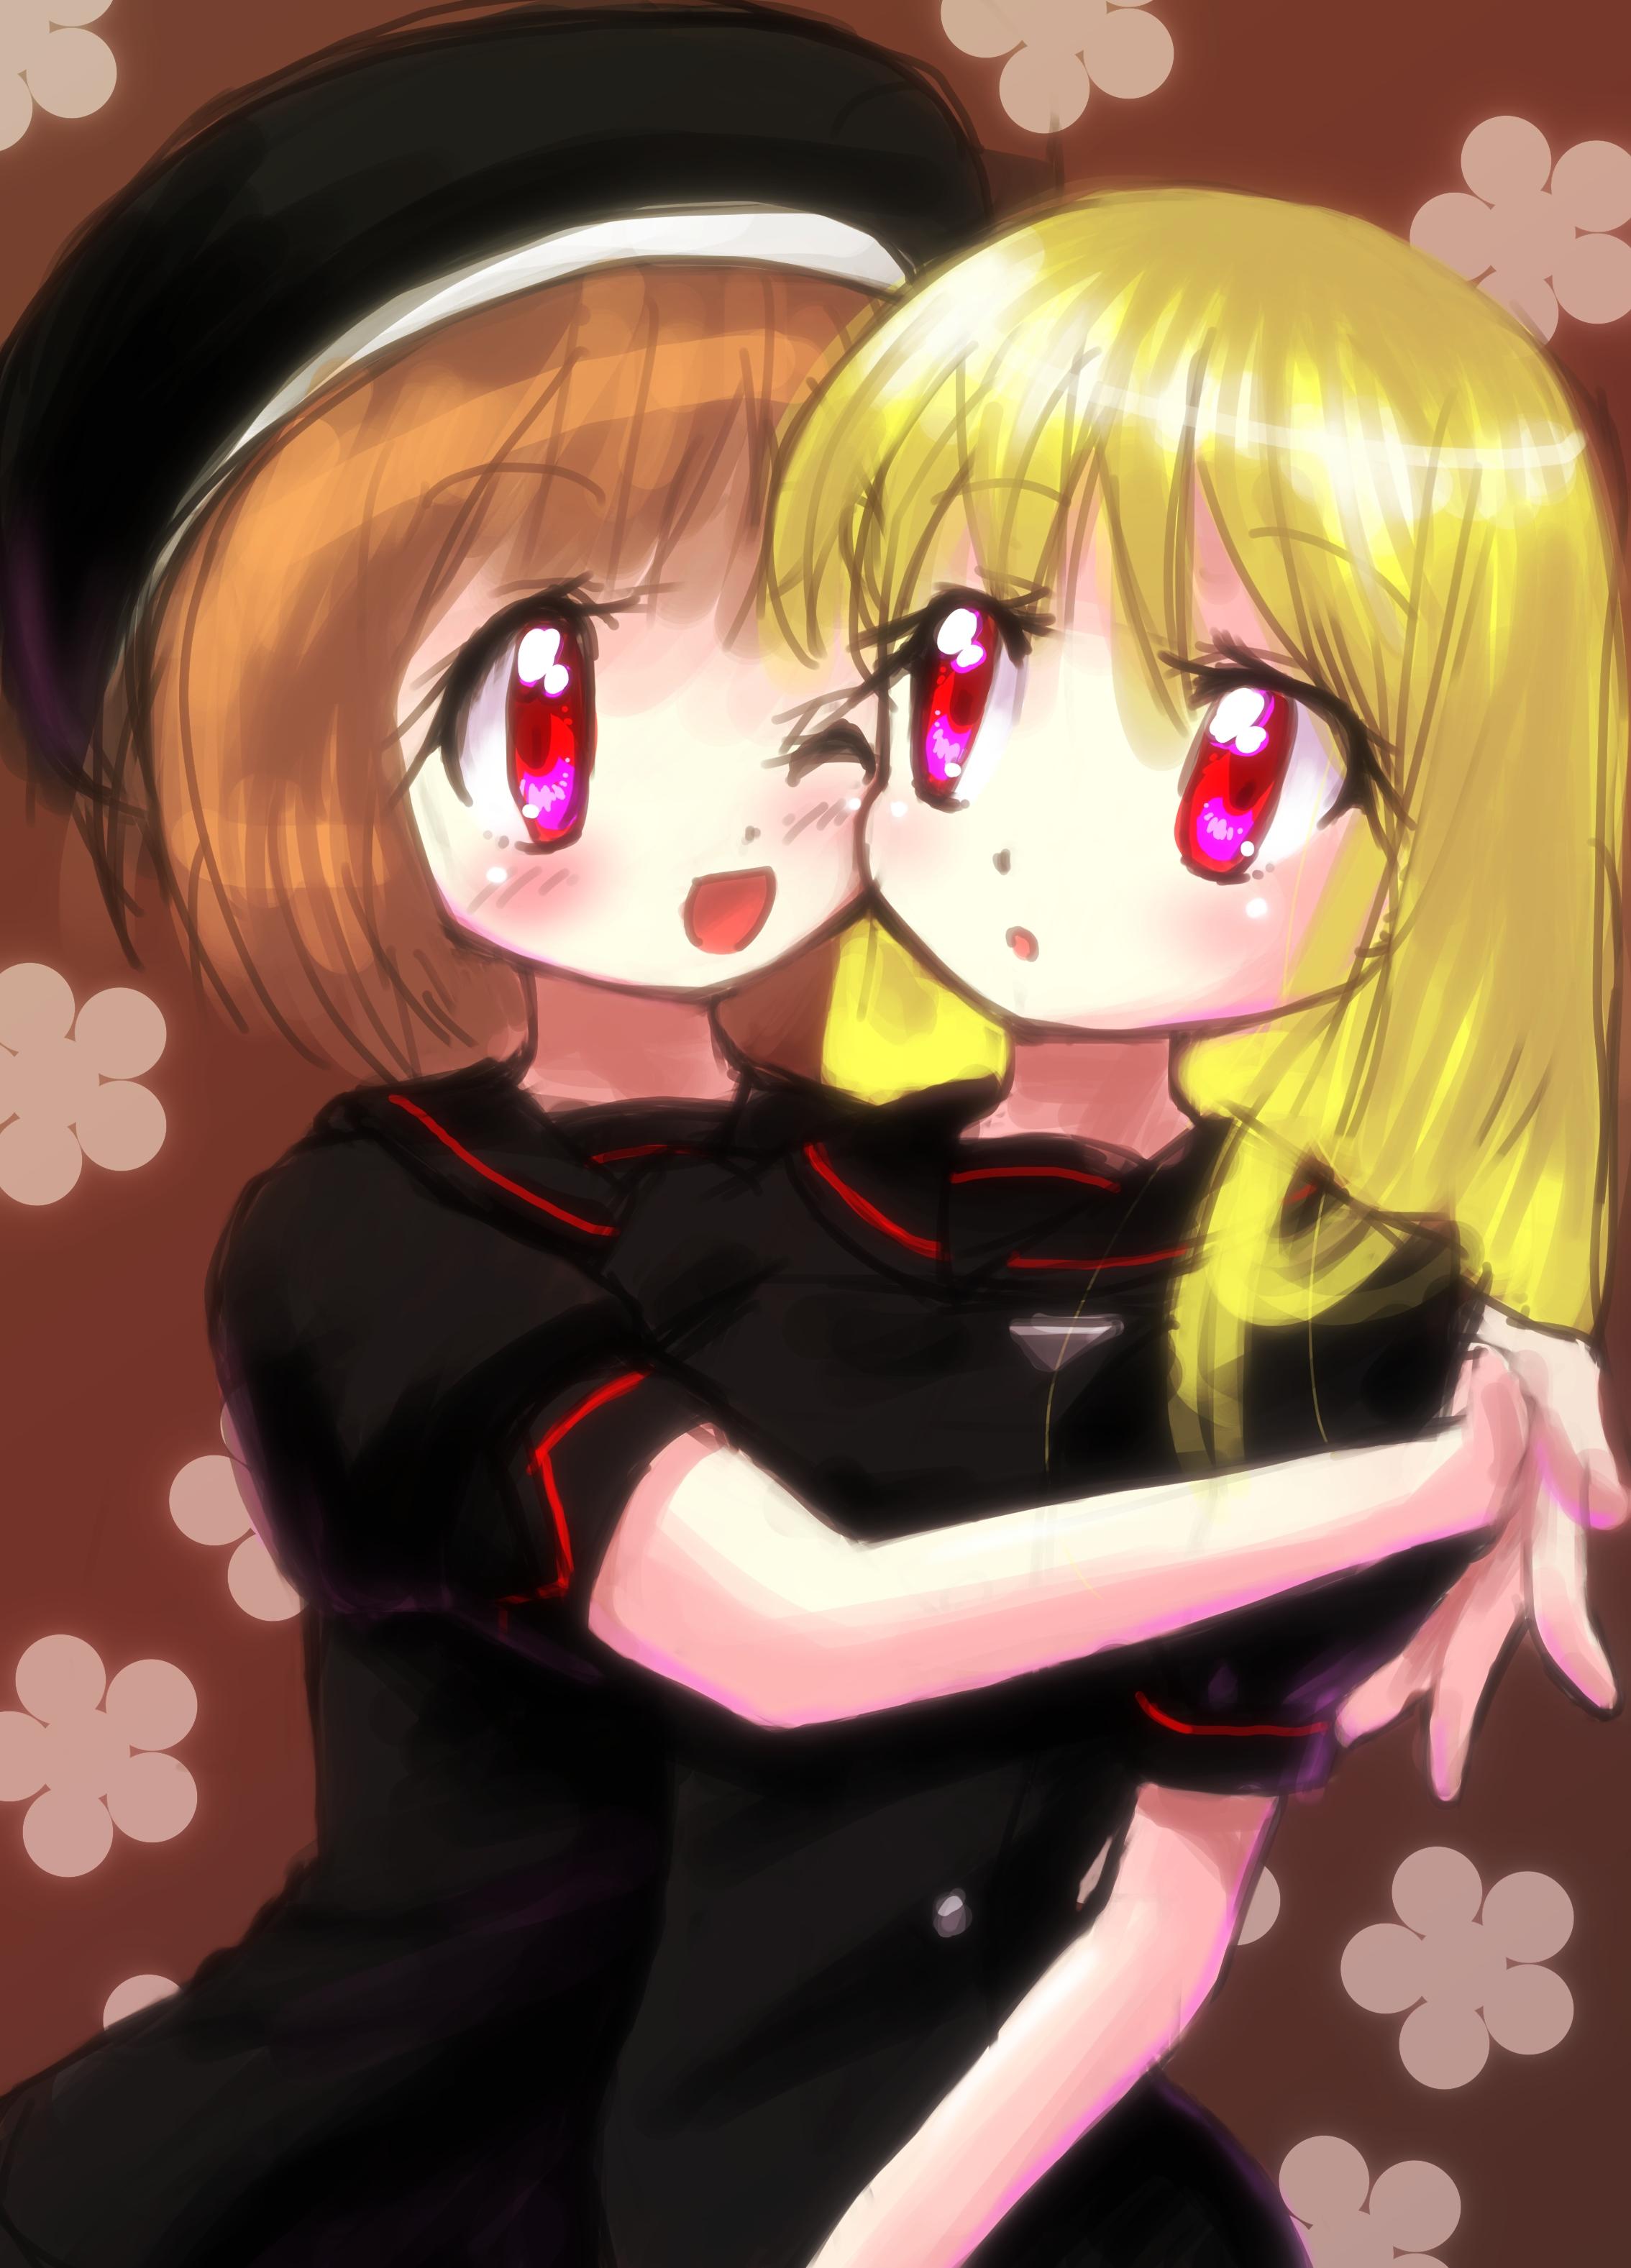 Anime Yuri Hentai Lesbisch